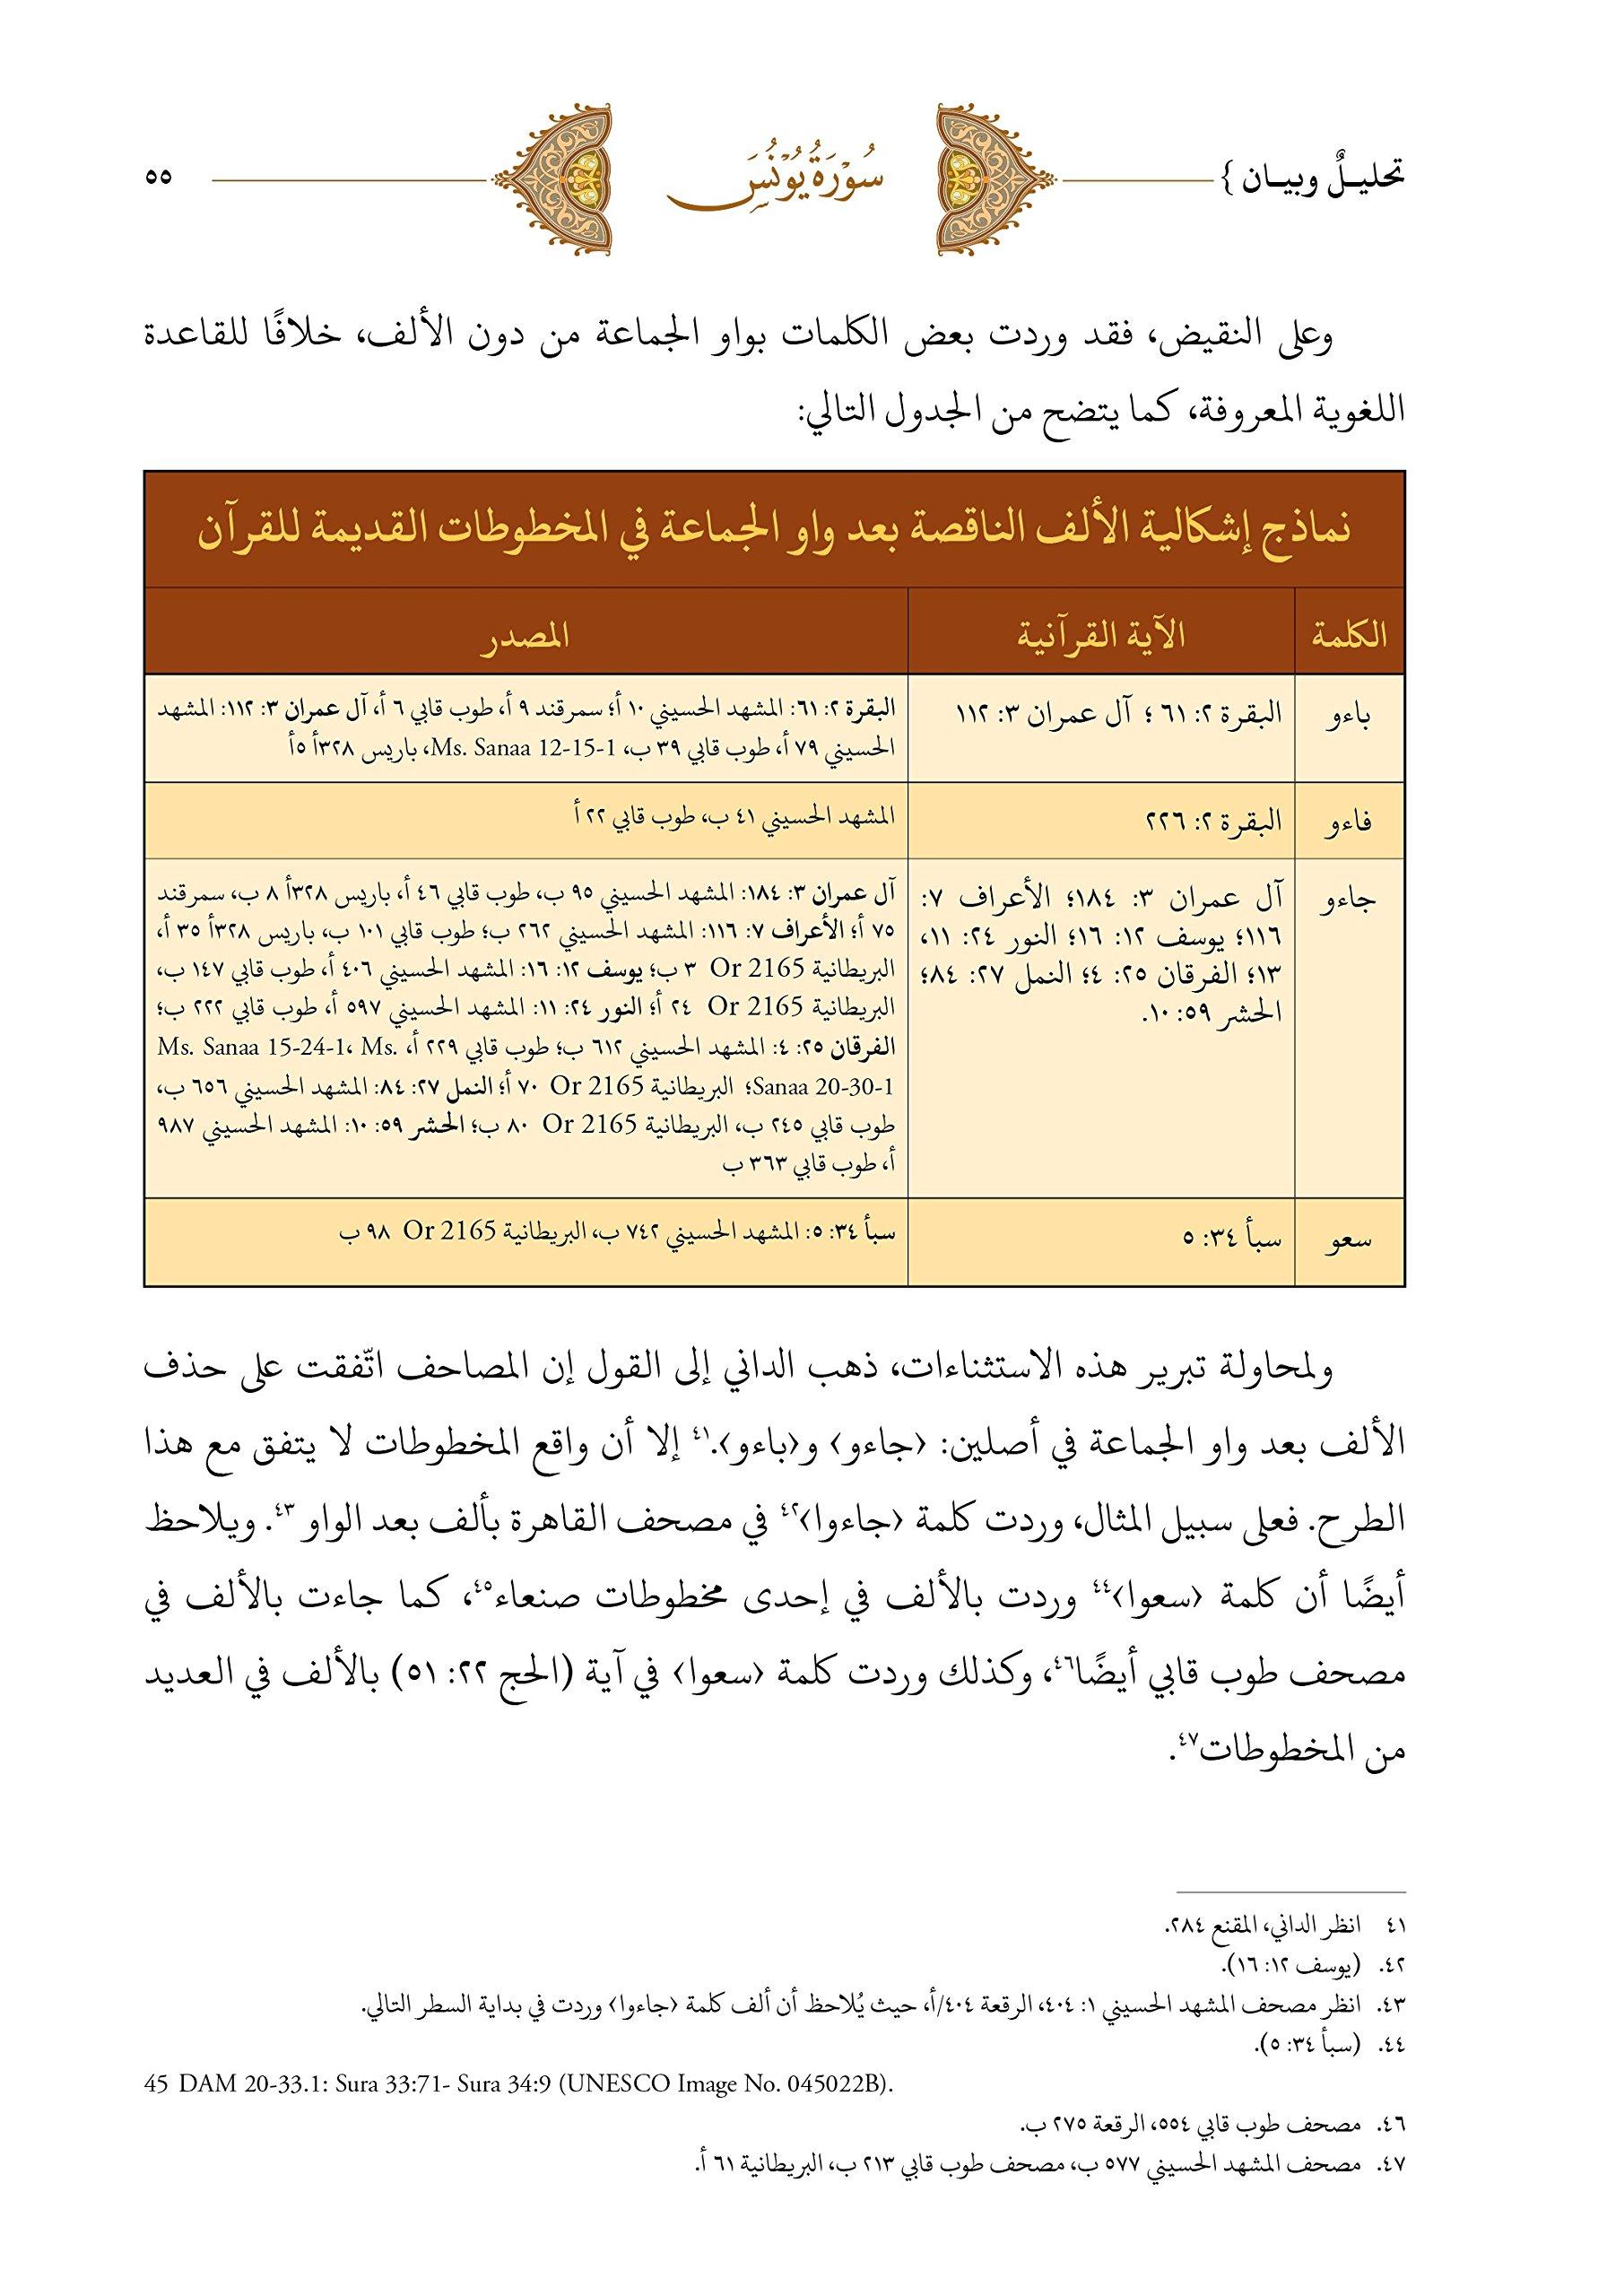 The Qur An Analysis And Explanation Volume Two القرآن تحليل وبيان المجلد الثاني Arabic Version Malek Meselmani Mohamed Lamsiah 9781935577522 Amazon Com Books